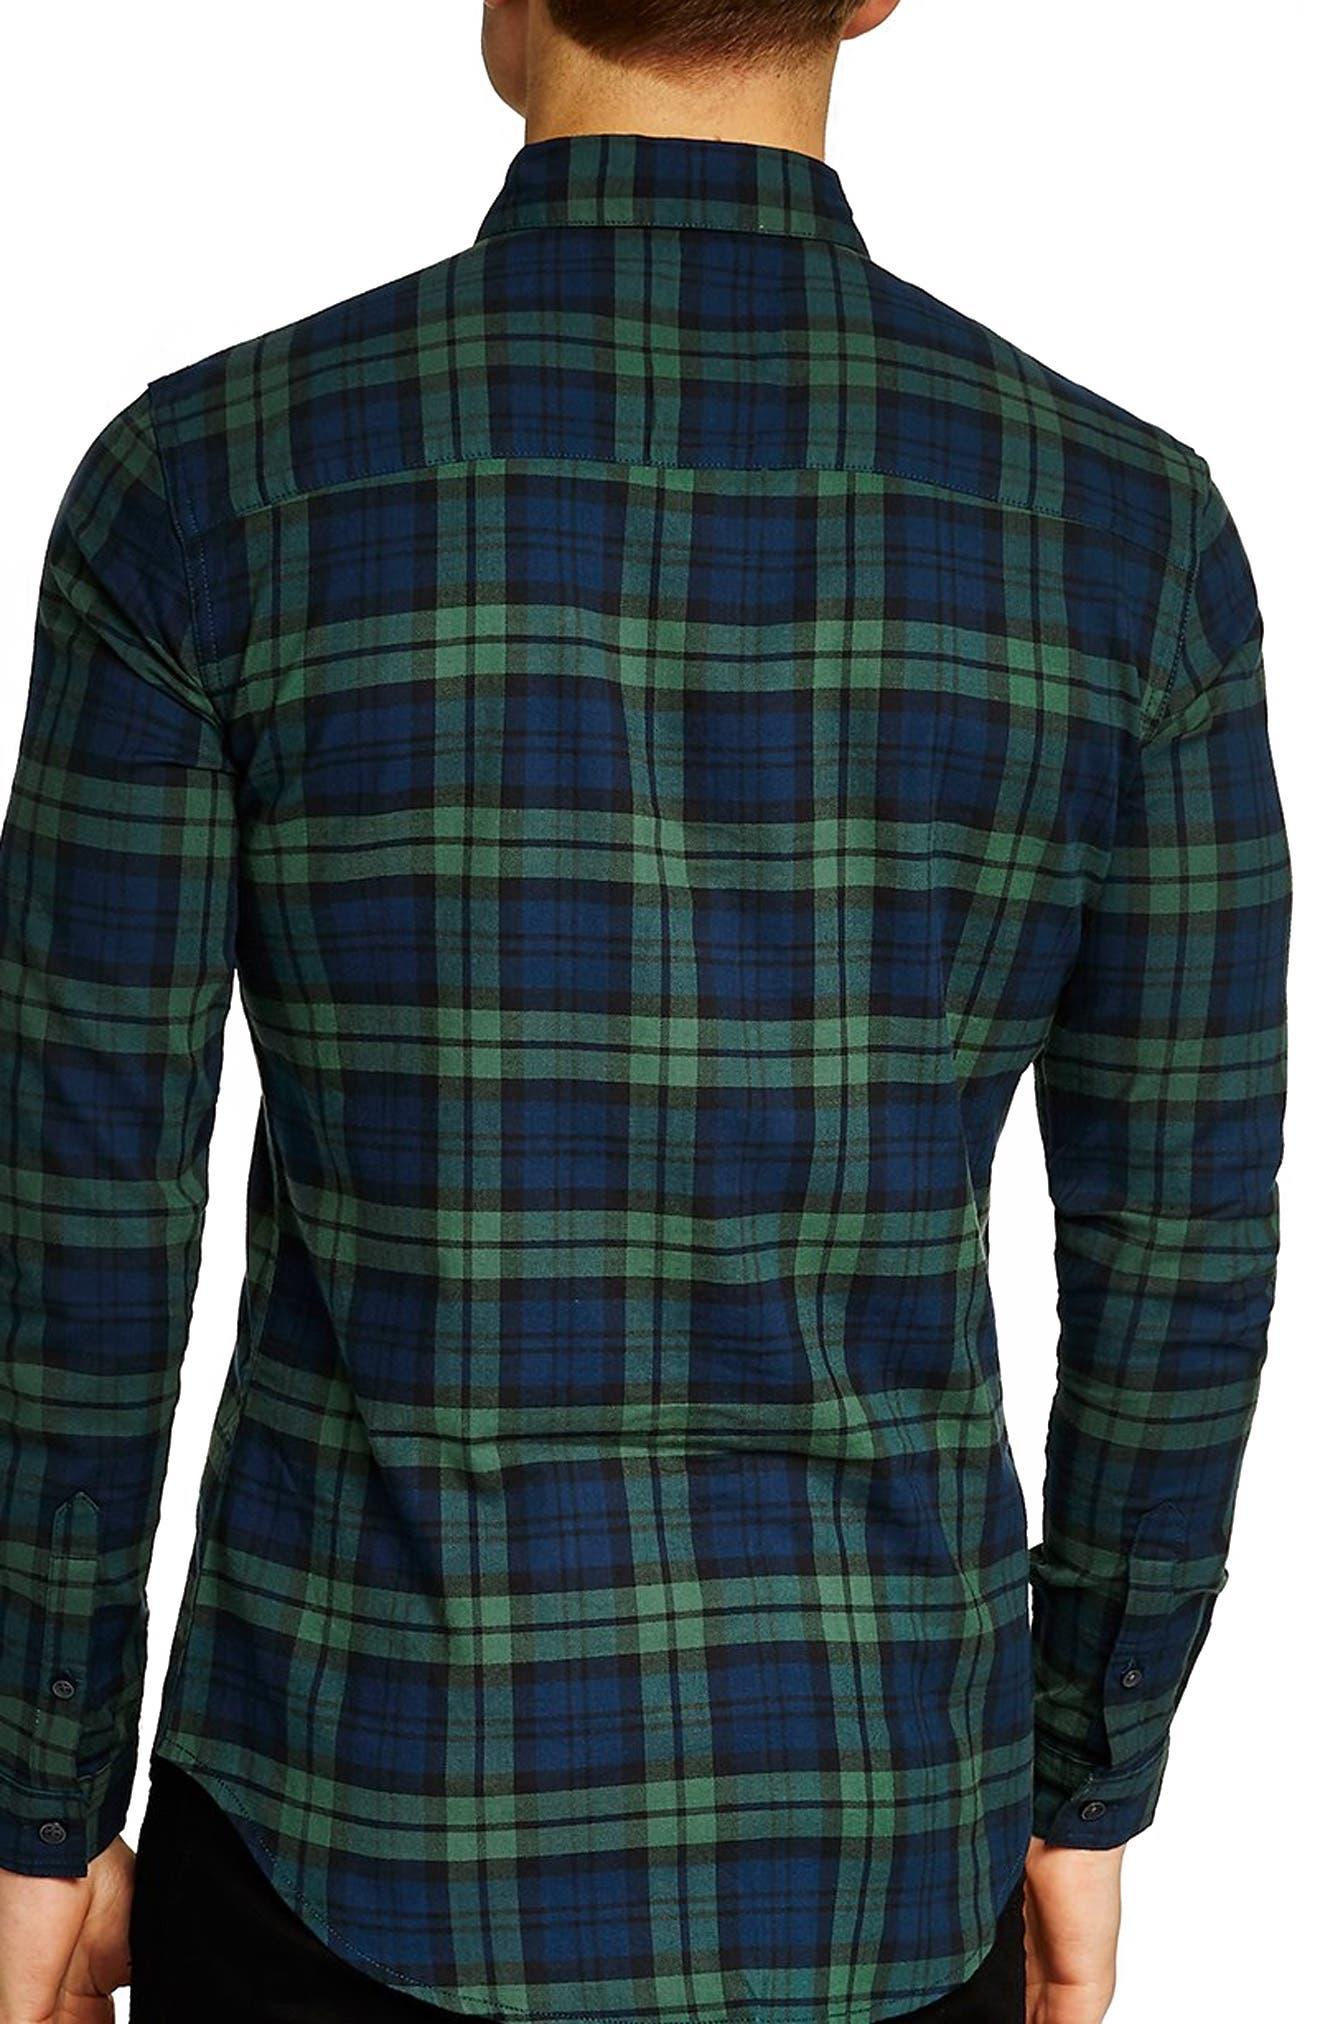 Muscle Fit Black Watch Plaid Shirt,                             Alternate thumbnail 2, color,                             411